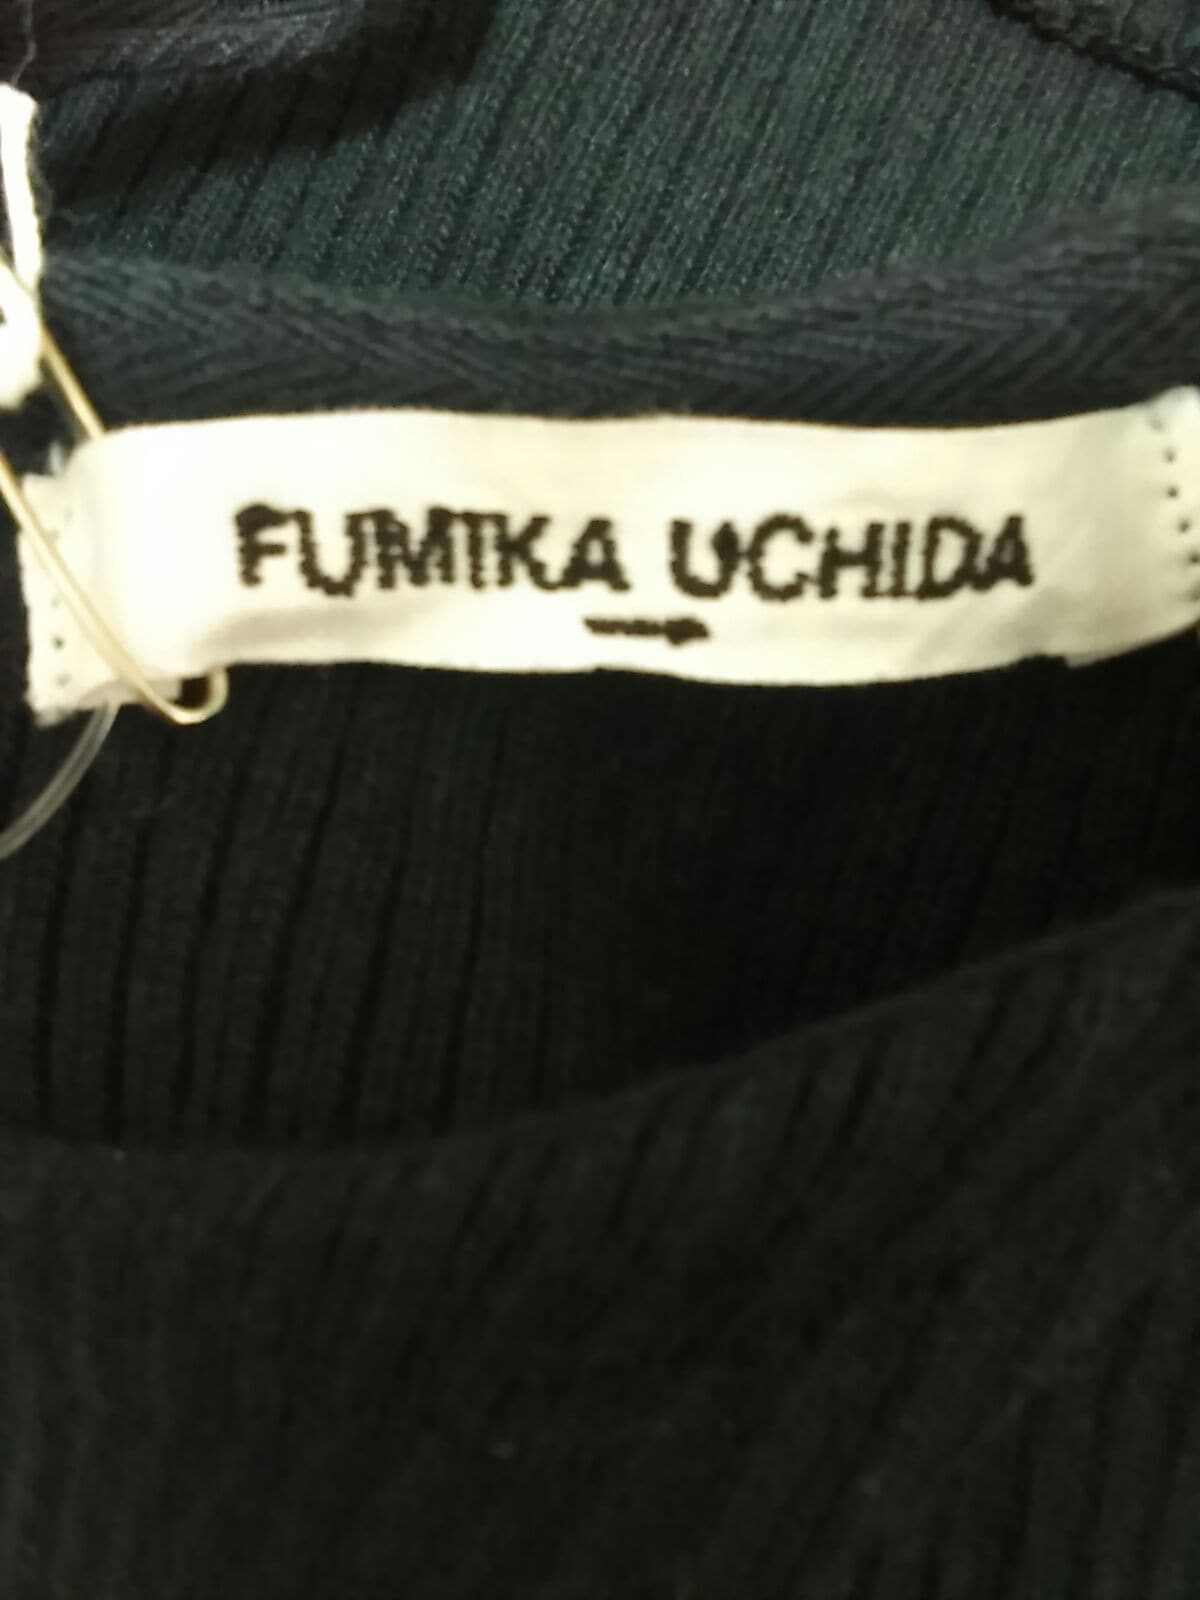 FUMIKA UCHIDA(フミカウチダ)のチュニック